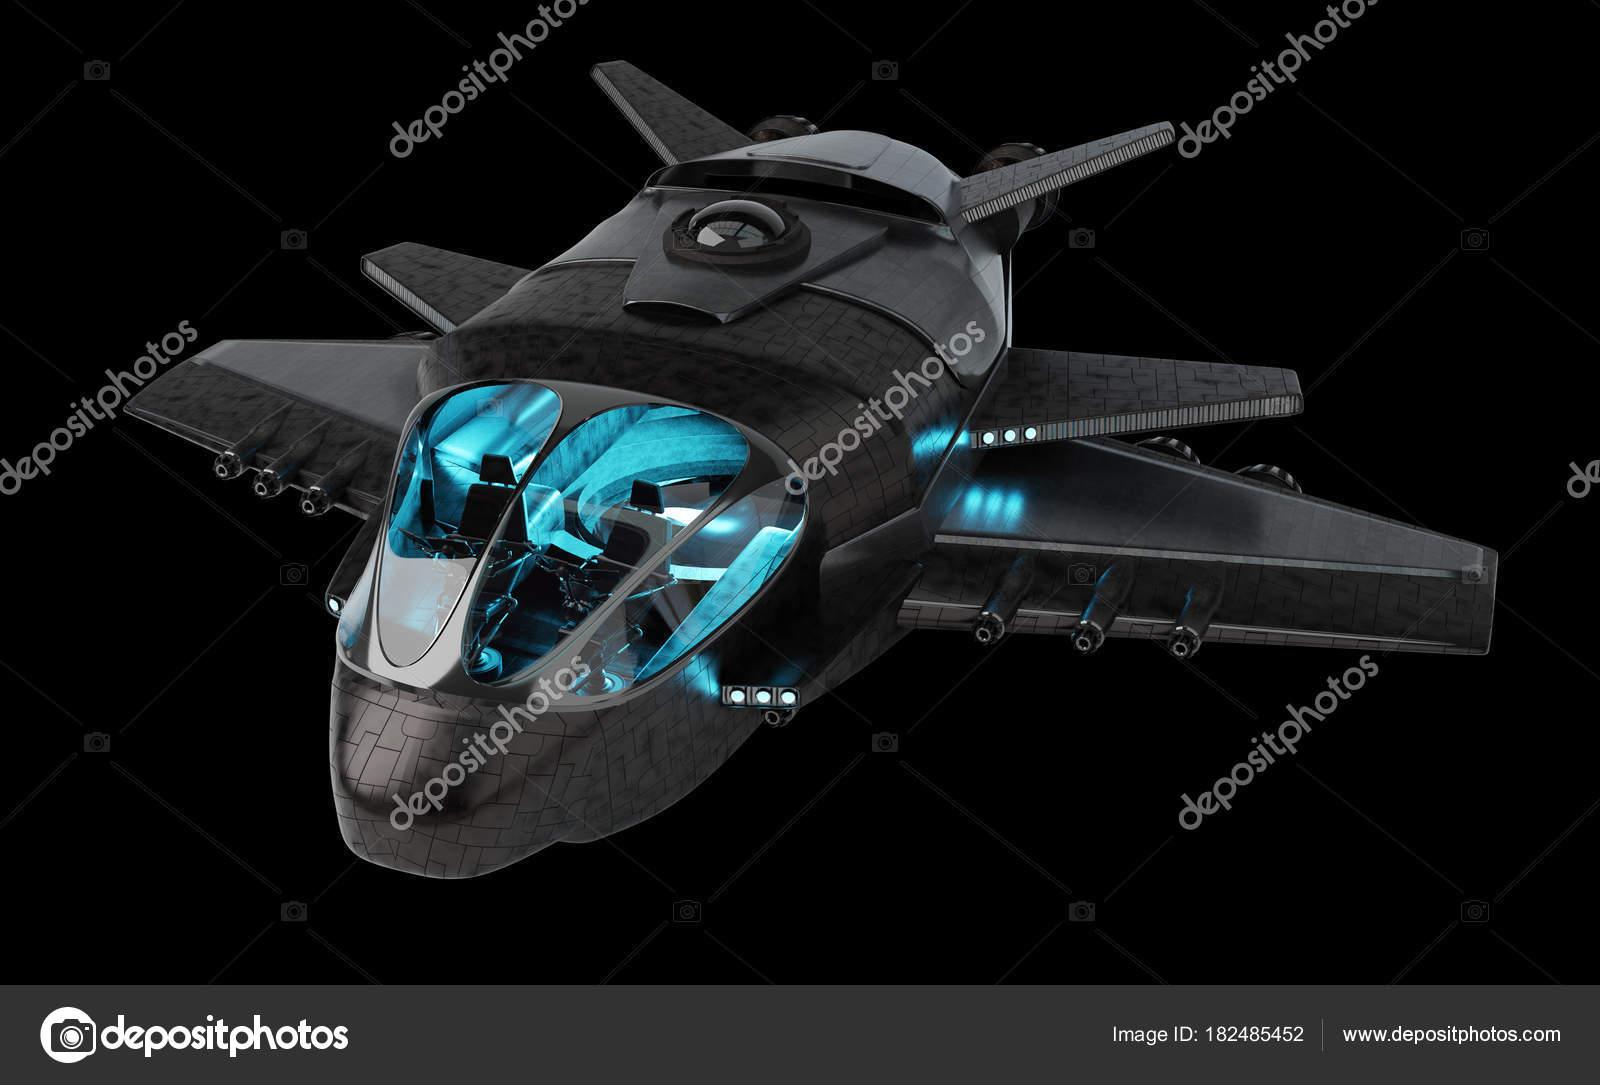 Áˆ Star Wars Starship Wallpaper Stock Photos Royalty Free Spaceship On Black Images Download On Depositphotos